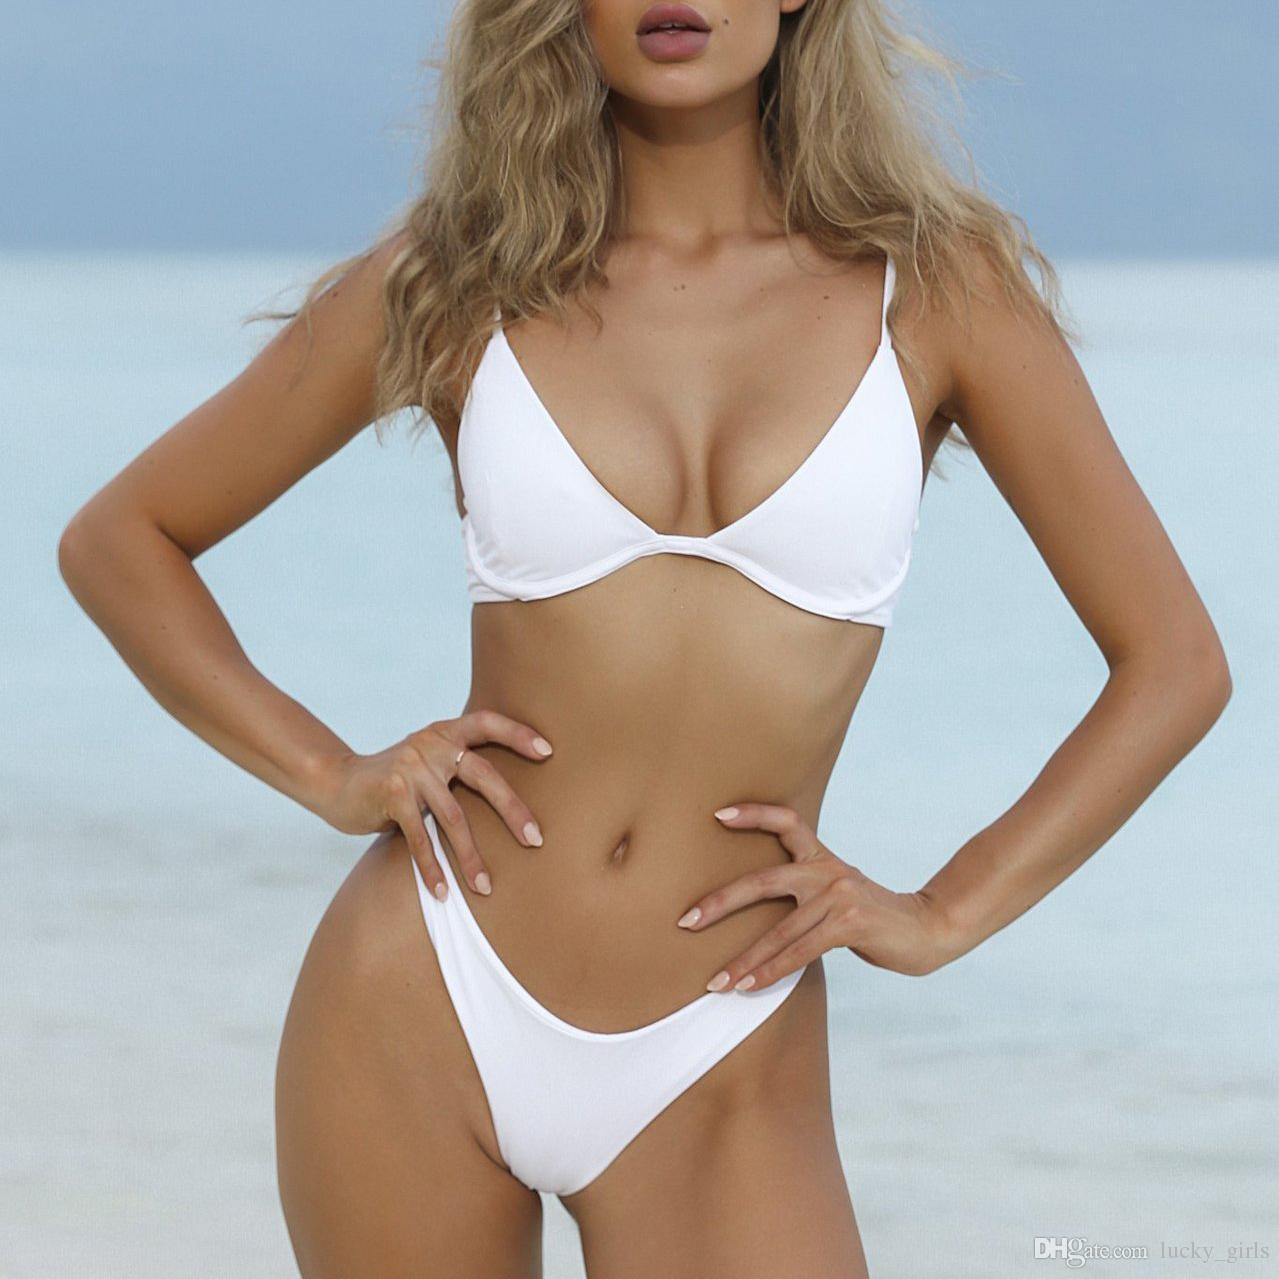 d15d8d6fd Compre Tanga Brasileira Bikini 2018 Underwire Push Up Conjunto Bikinis Swimwear  Mulheres Maiô Branco Preto Rosa Vermelho Maiô Beachwear De Lucky girls